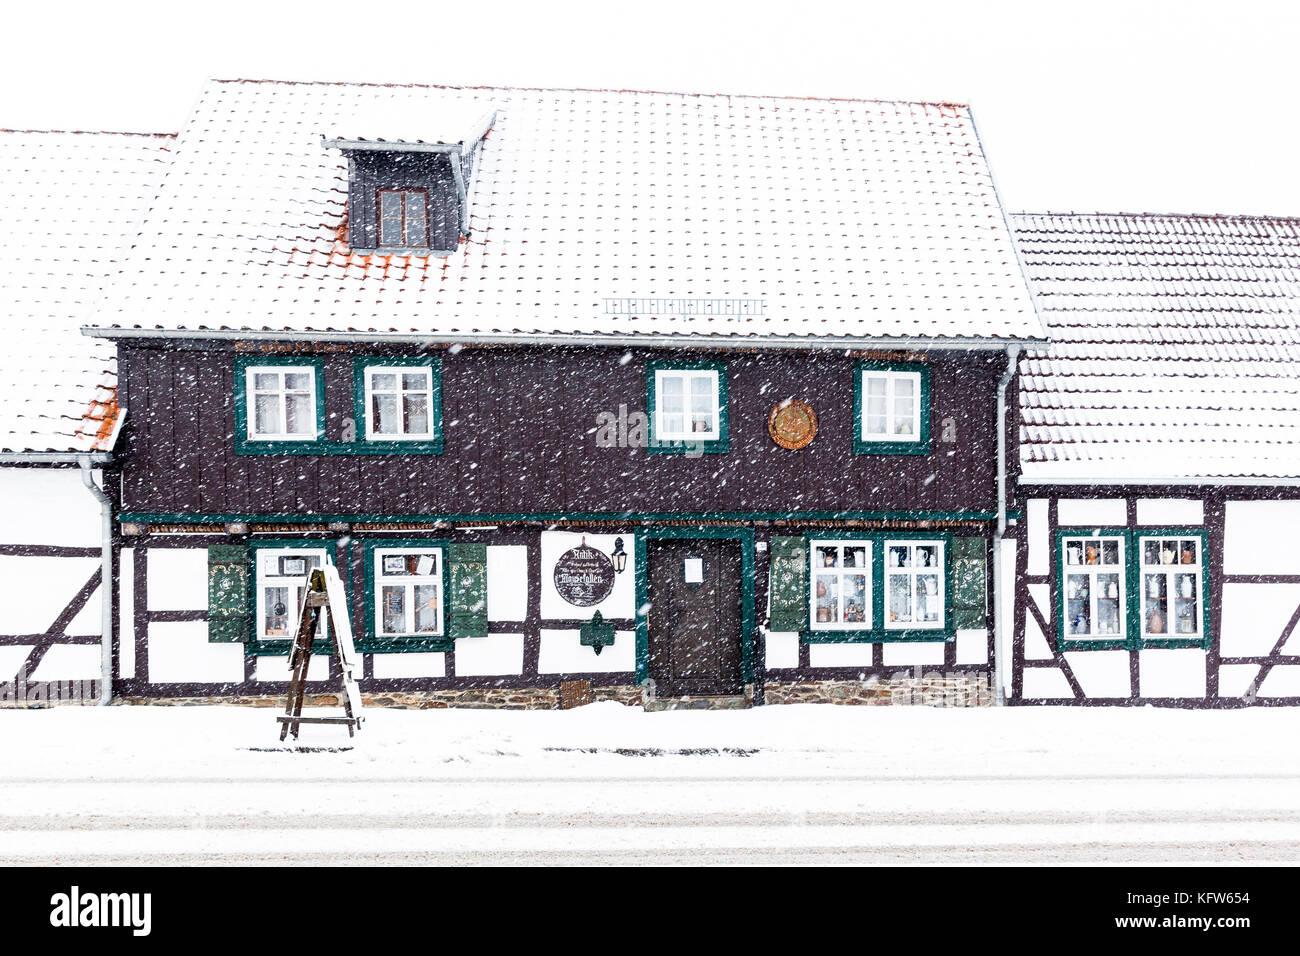 Musée Mausefallen Güntersberge im Winter Banque D'Images